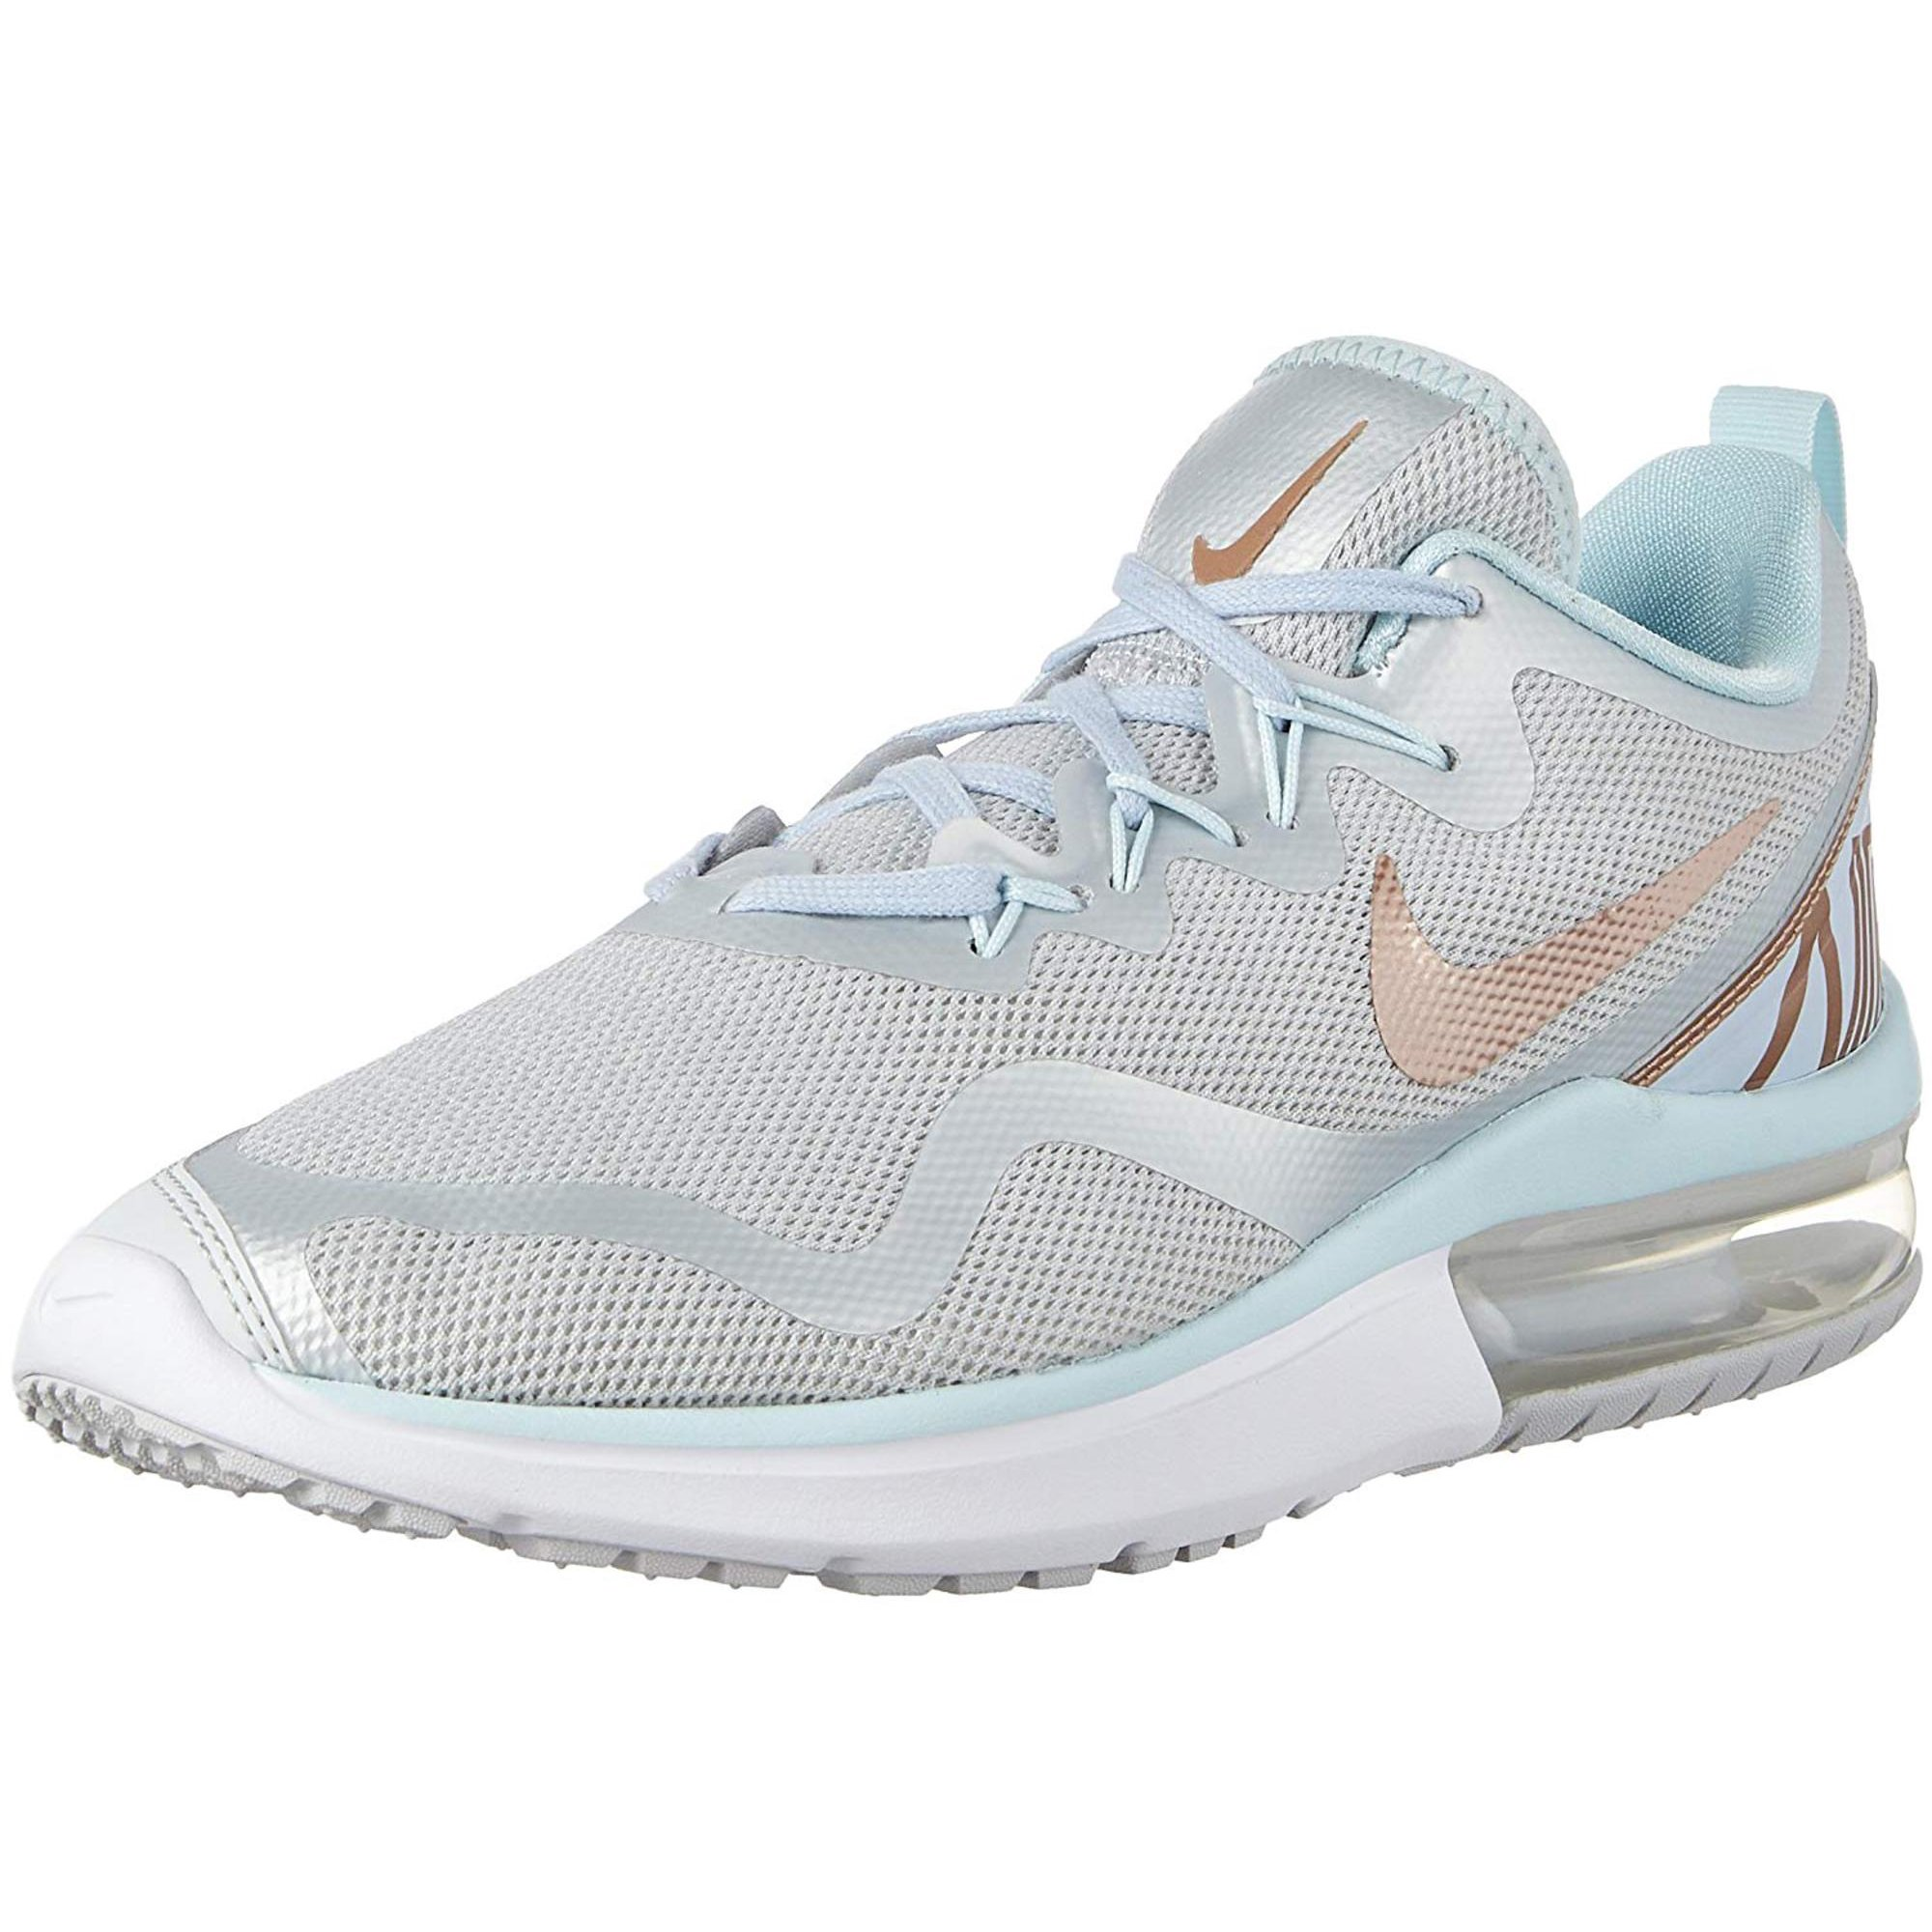 code promo d3ed0 72cc1 Nike Women's Shoes Air Max Fury Sneakers Pure Platinum